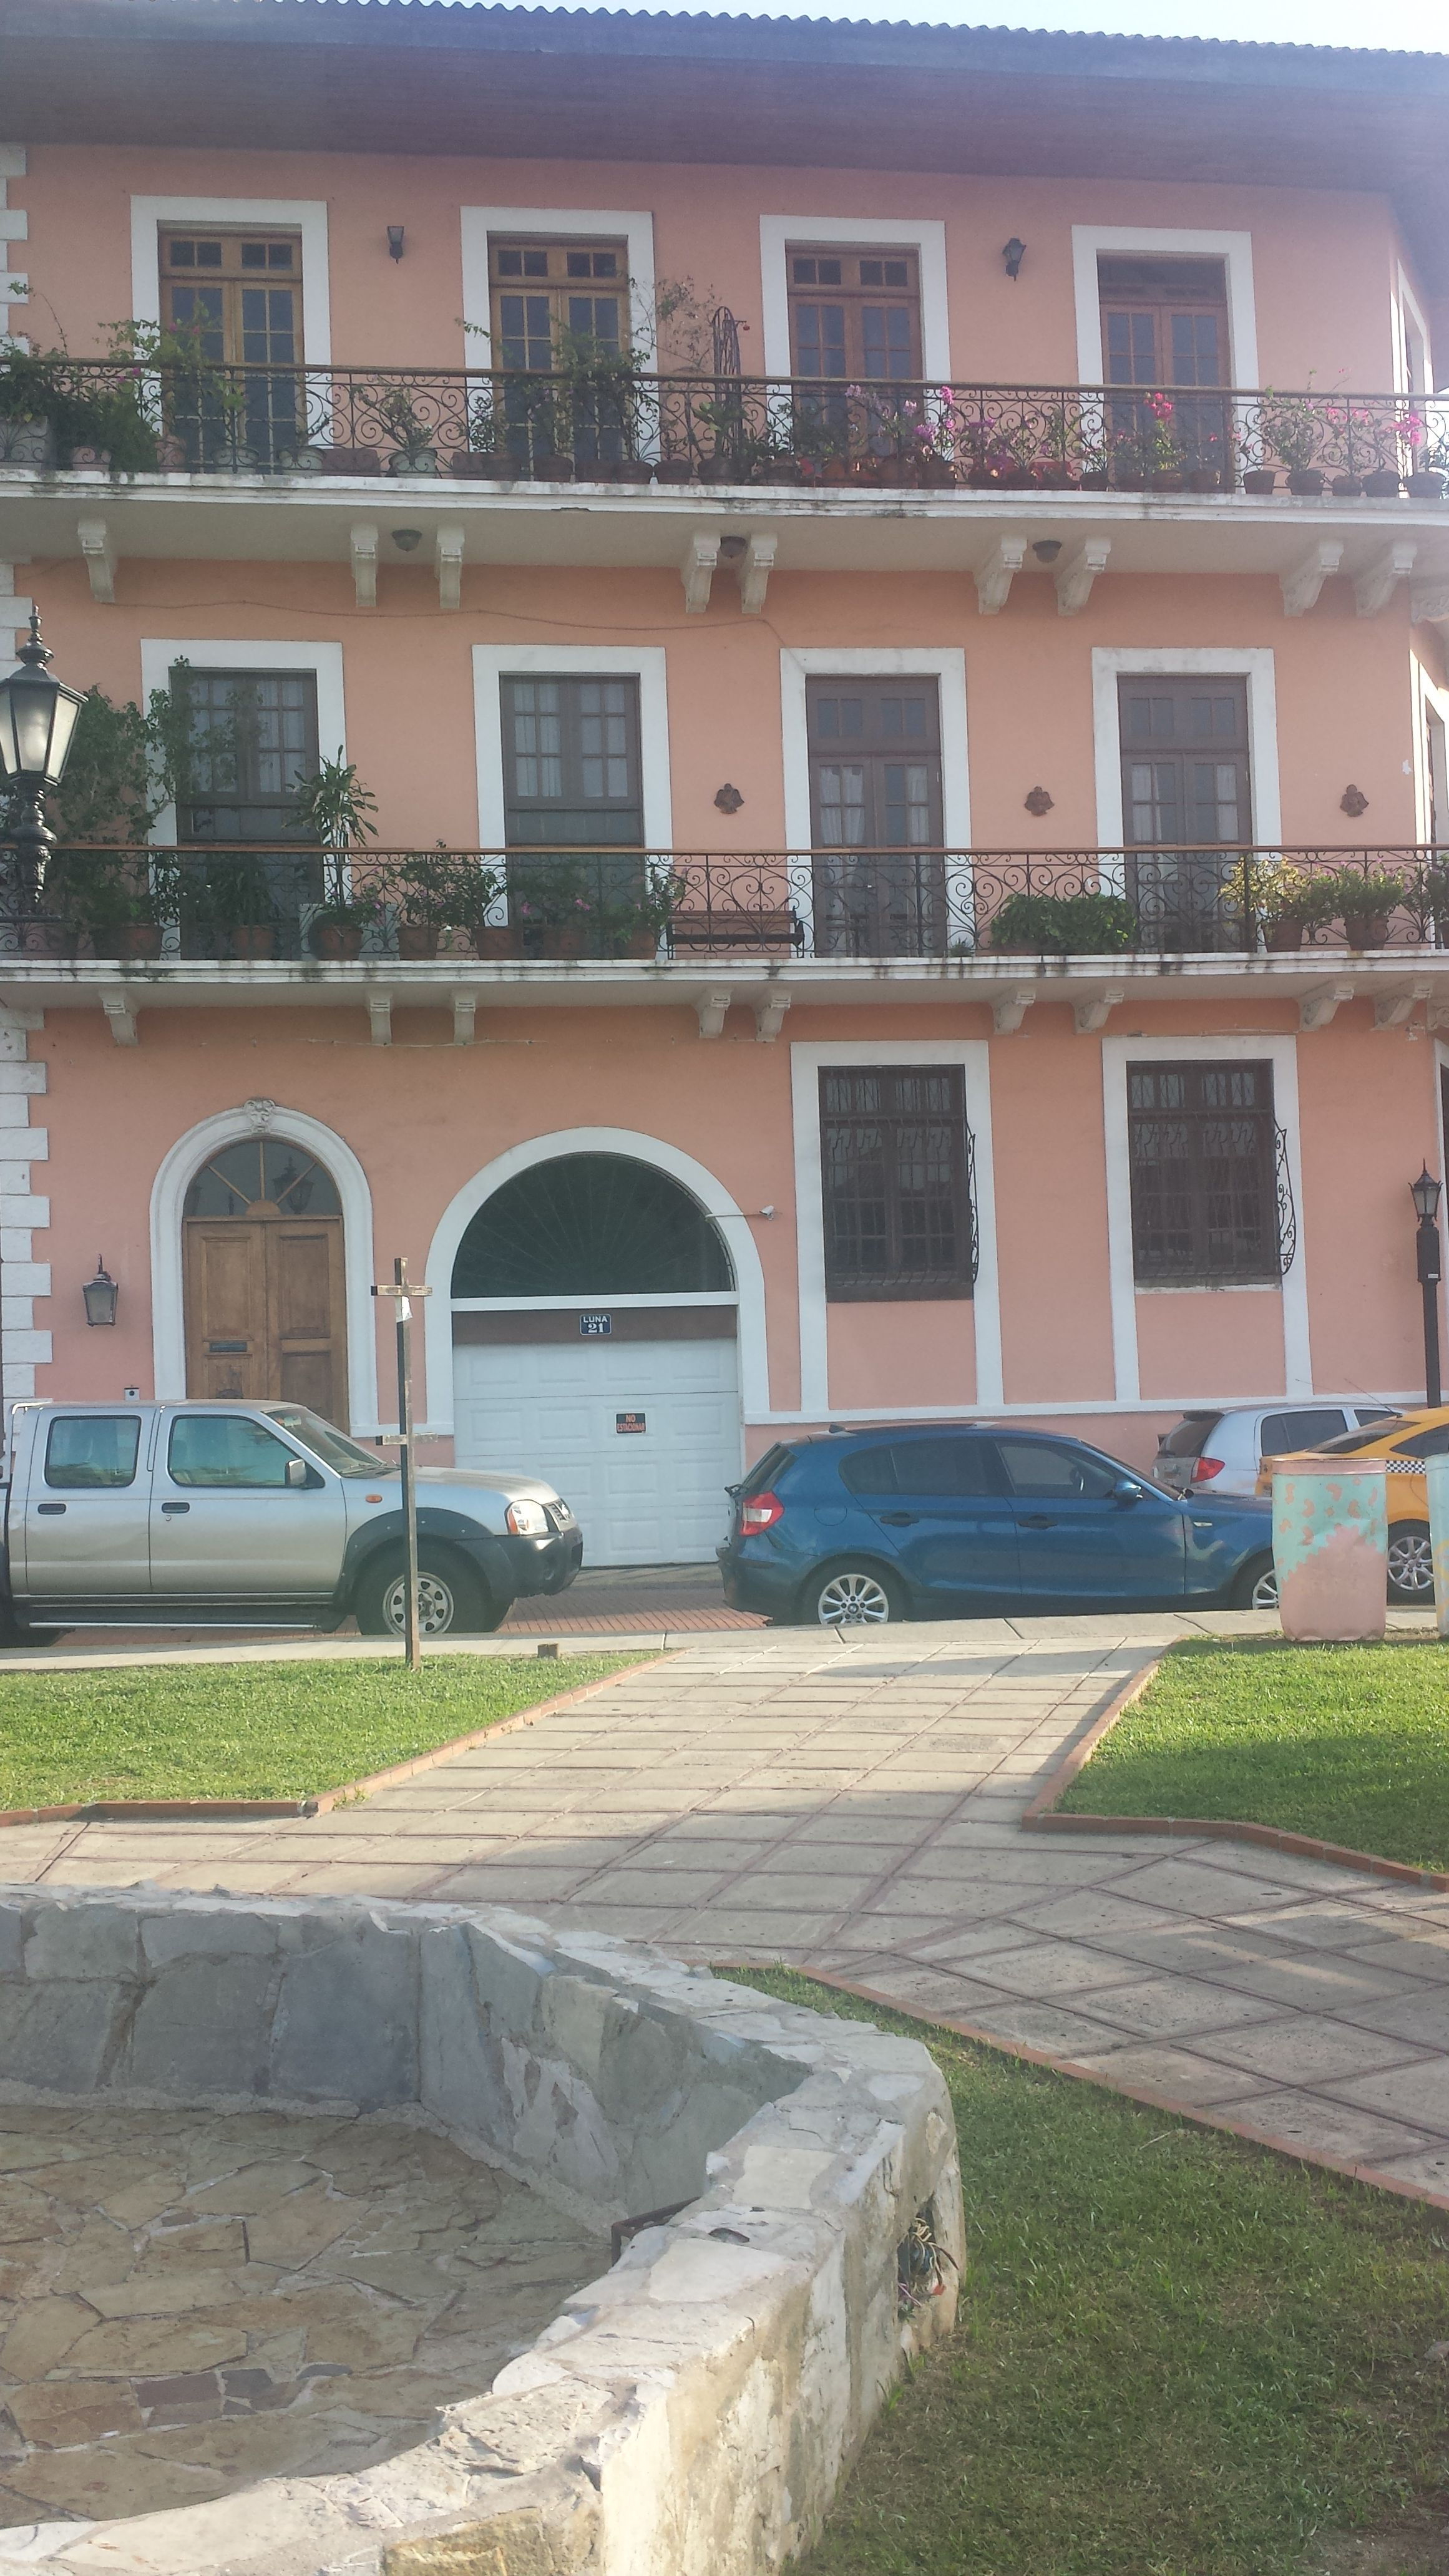 Casco Antiguo en Ciudad de Panamá, Panamá - Casa de Rubén Blades